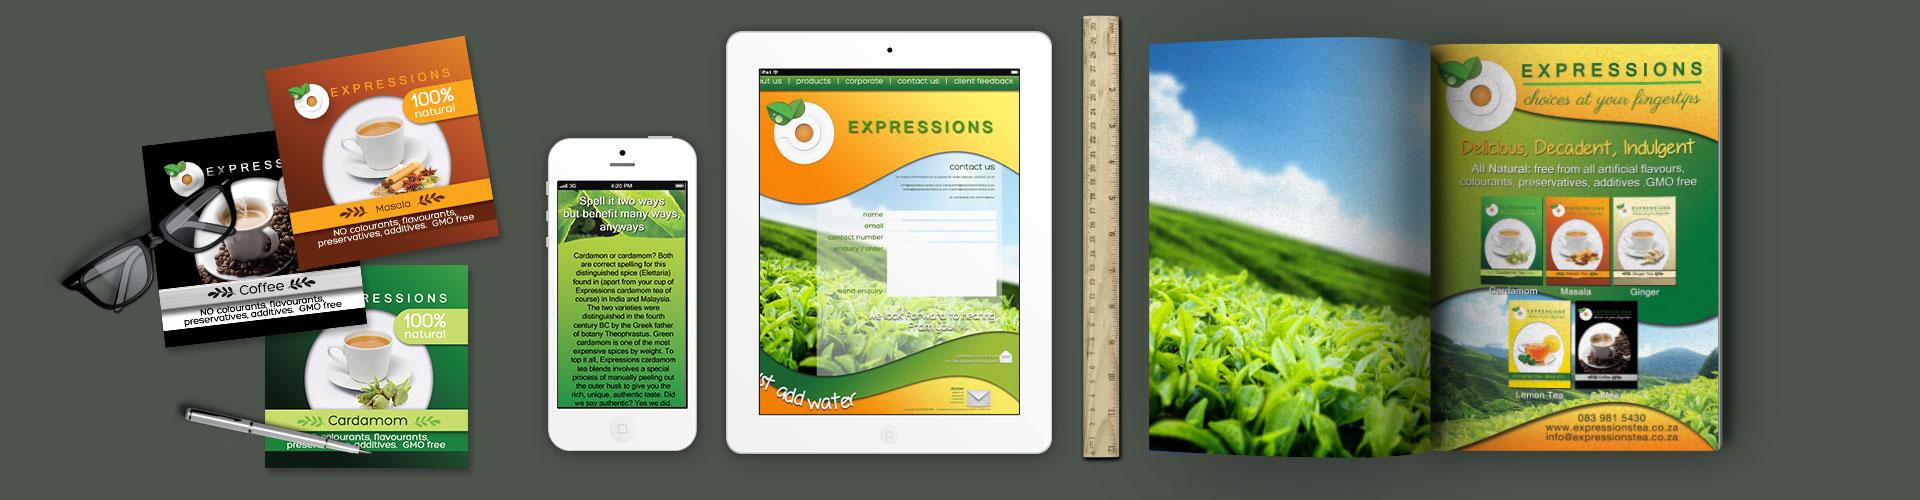 expressions-tea header image